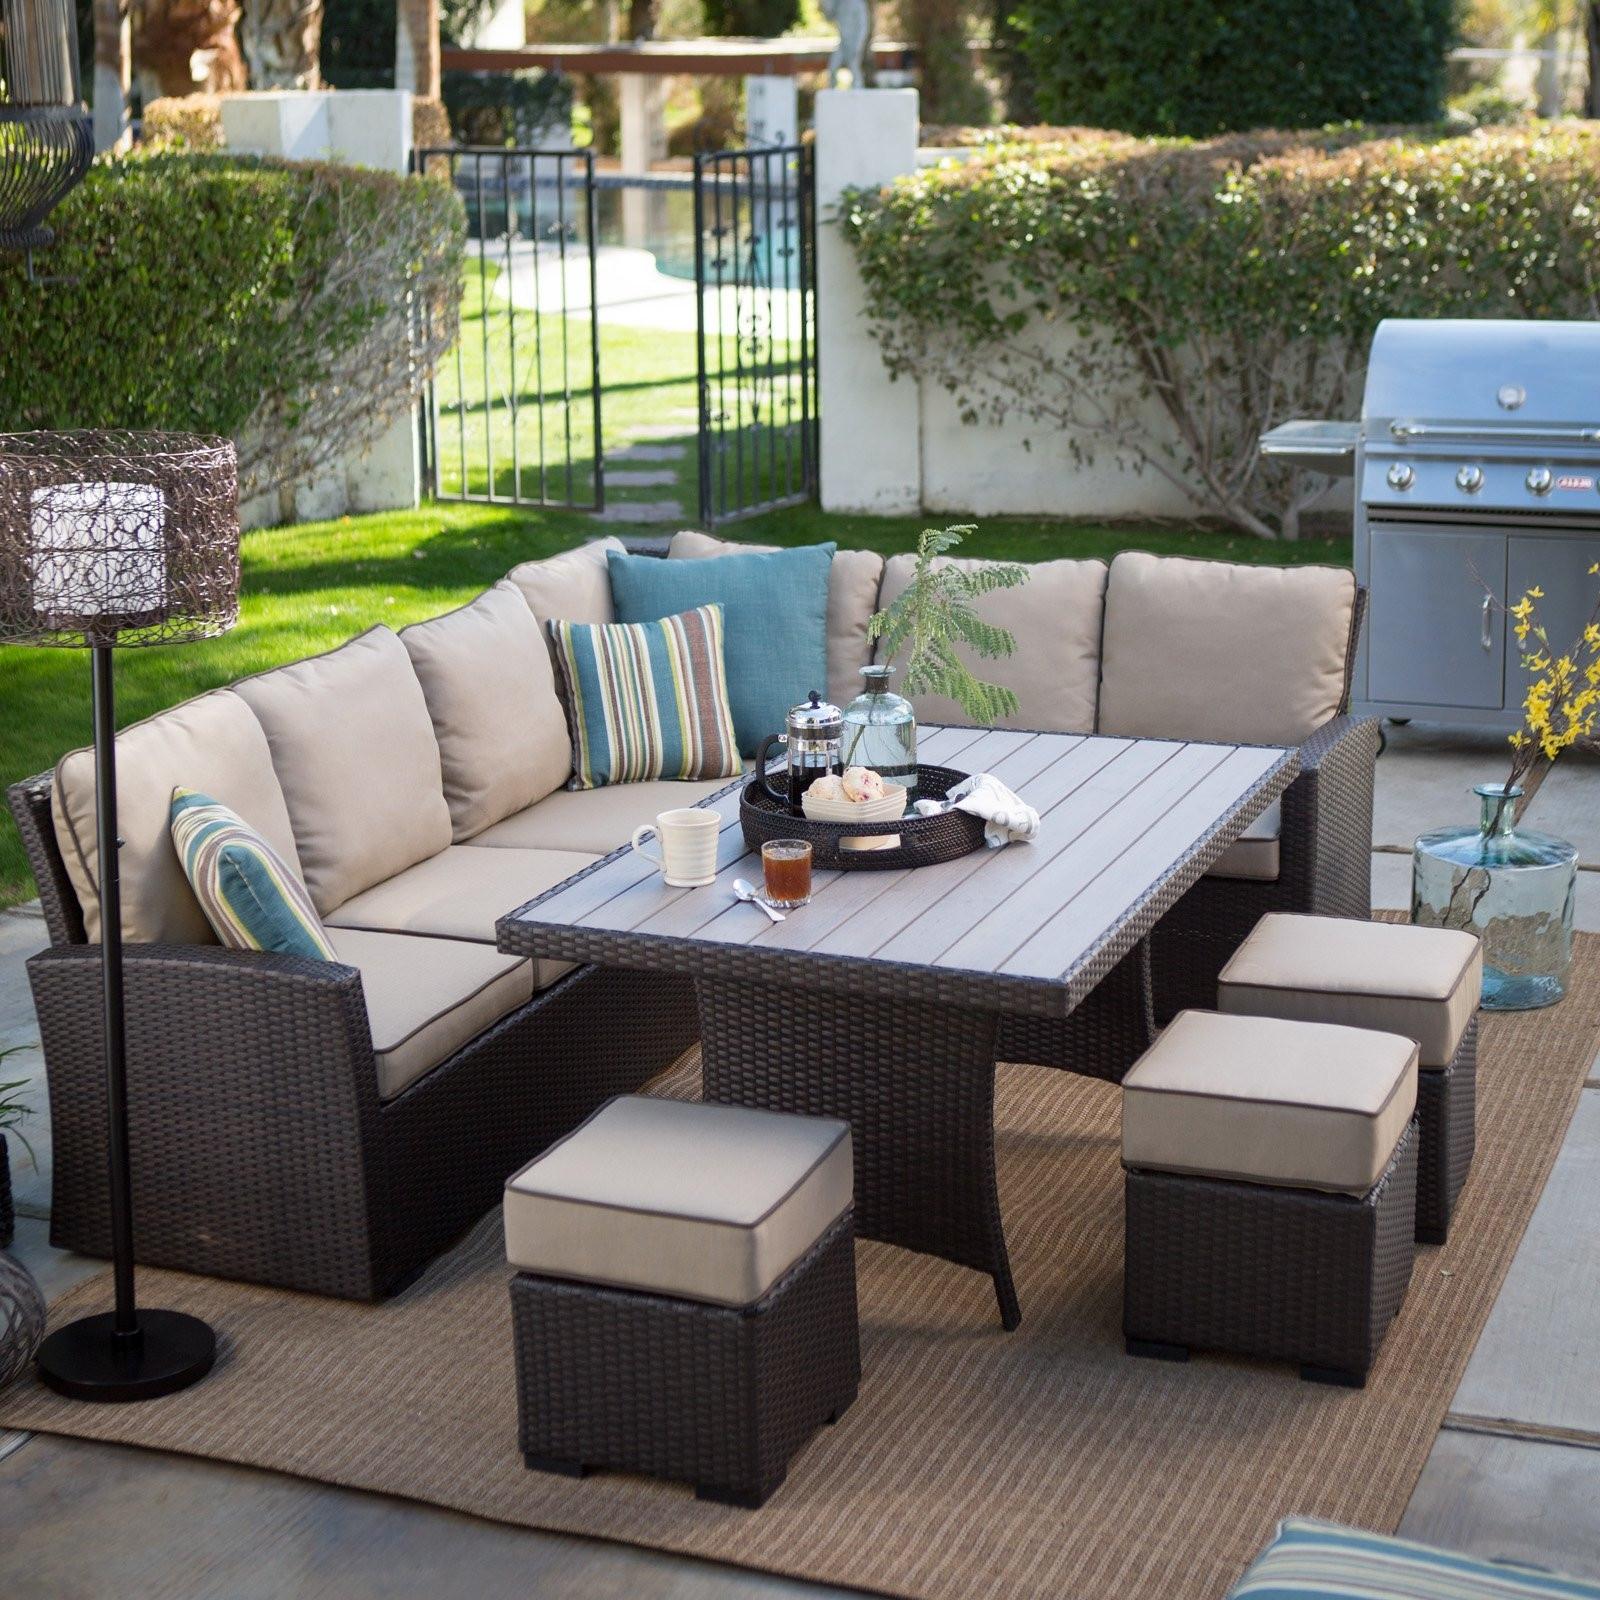 Wayfair Outdoor Conversation Sets Wayfair Outdoor Furniture Inside Widely Used Wayfair Outdoor Patio Conversation Sets (View 3 of 20)